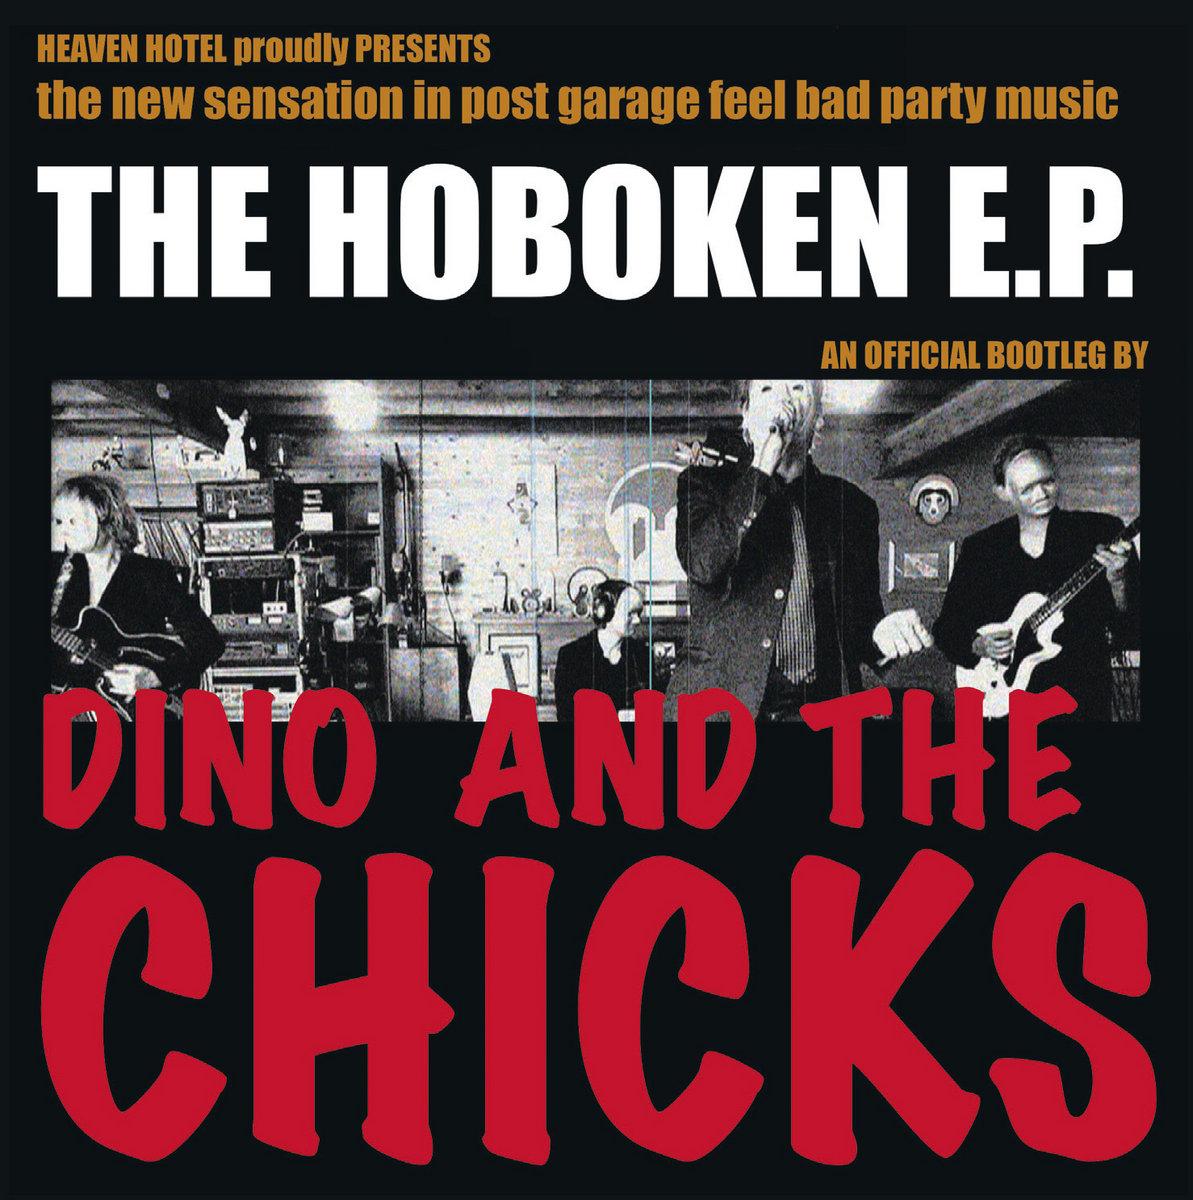 Dino and The Chicks - The Hoboken EP